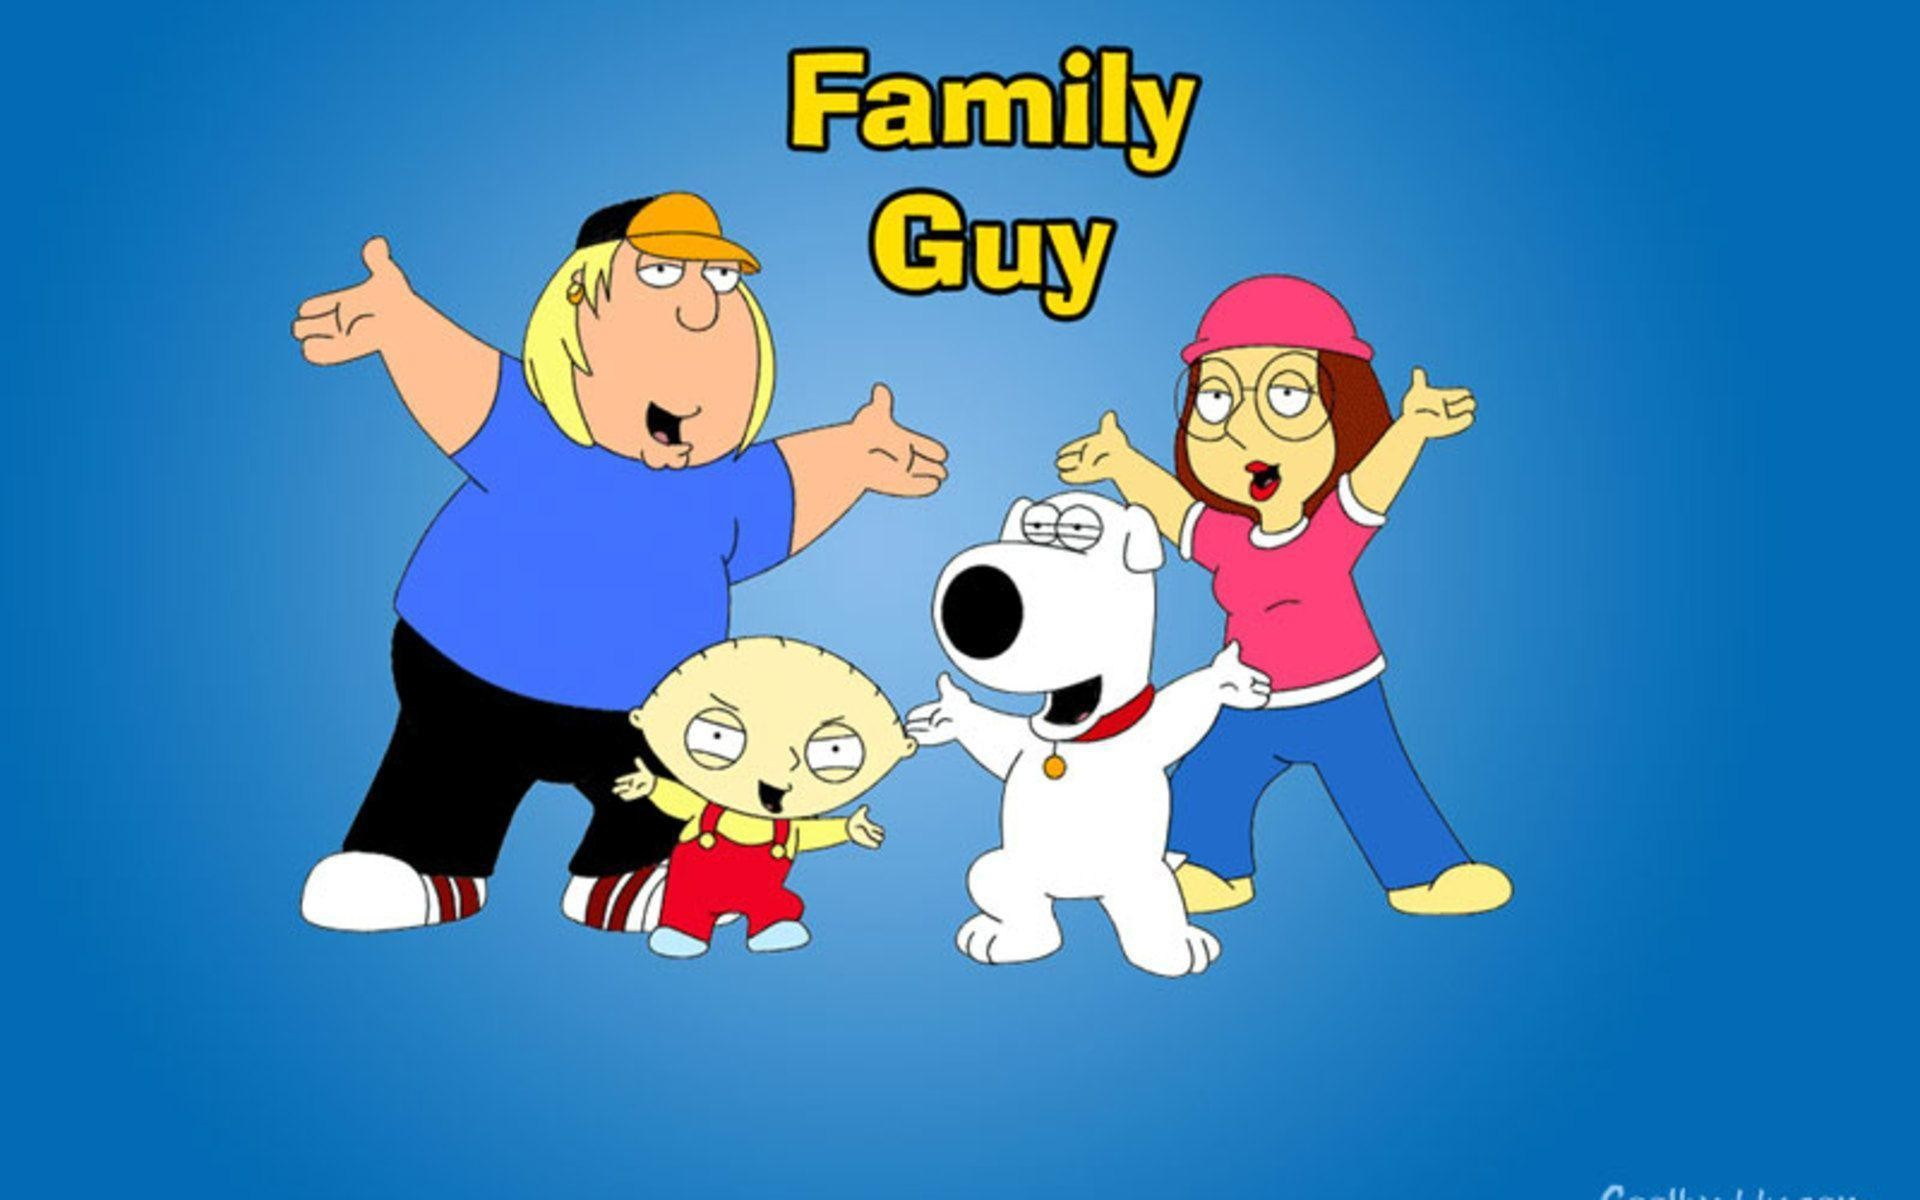 Family Guy Wallpapers, wallpaper, Family Guy Wallpapers hd .